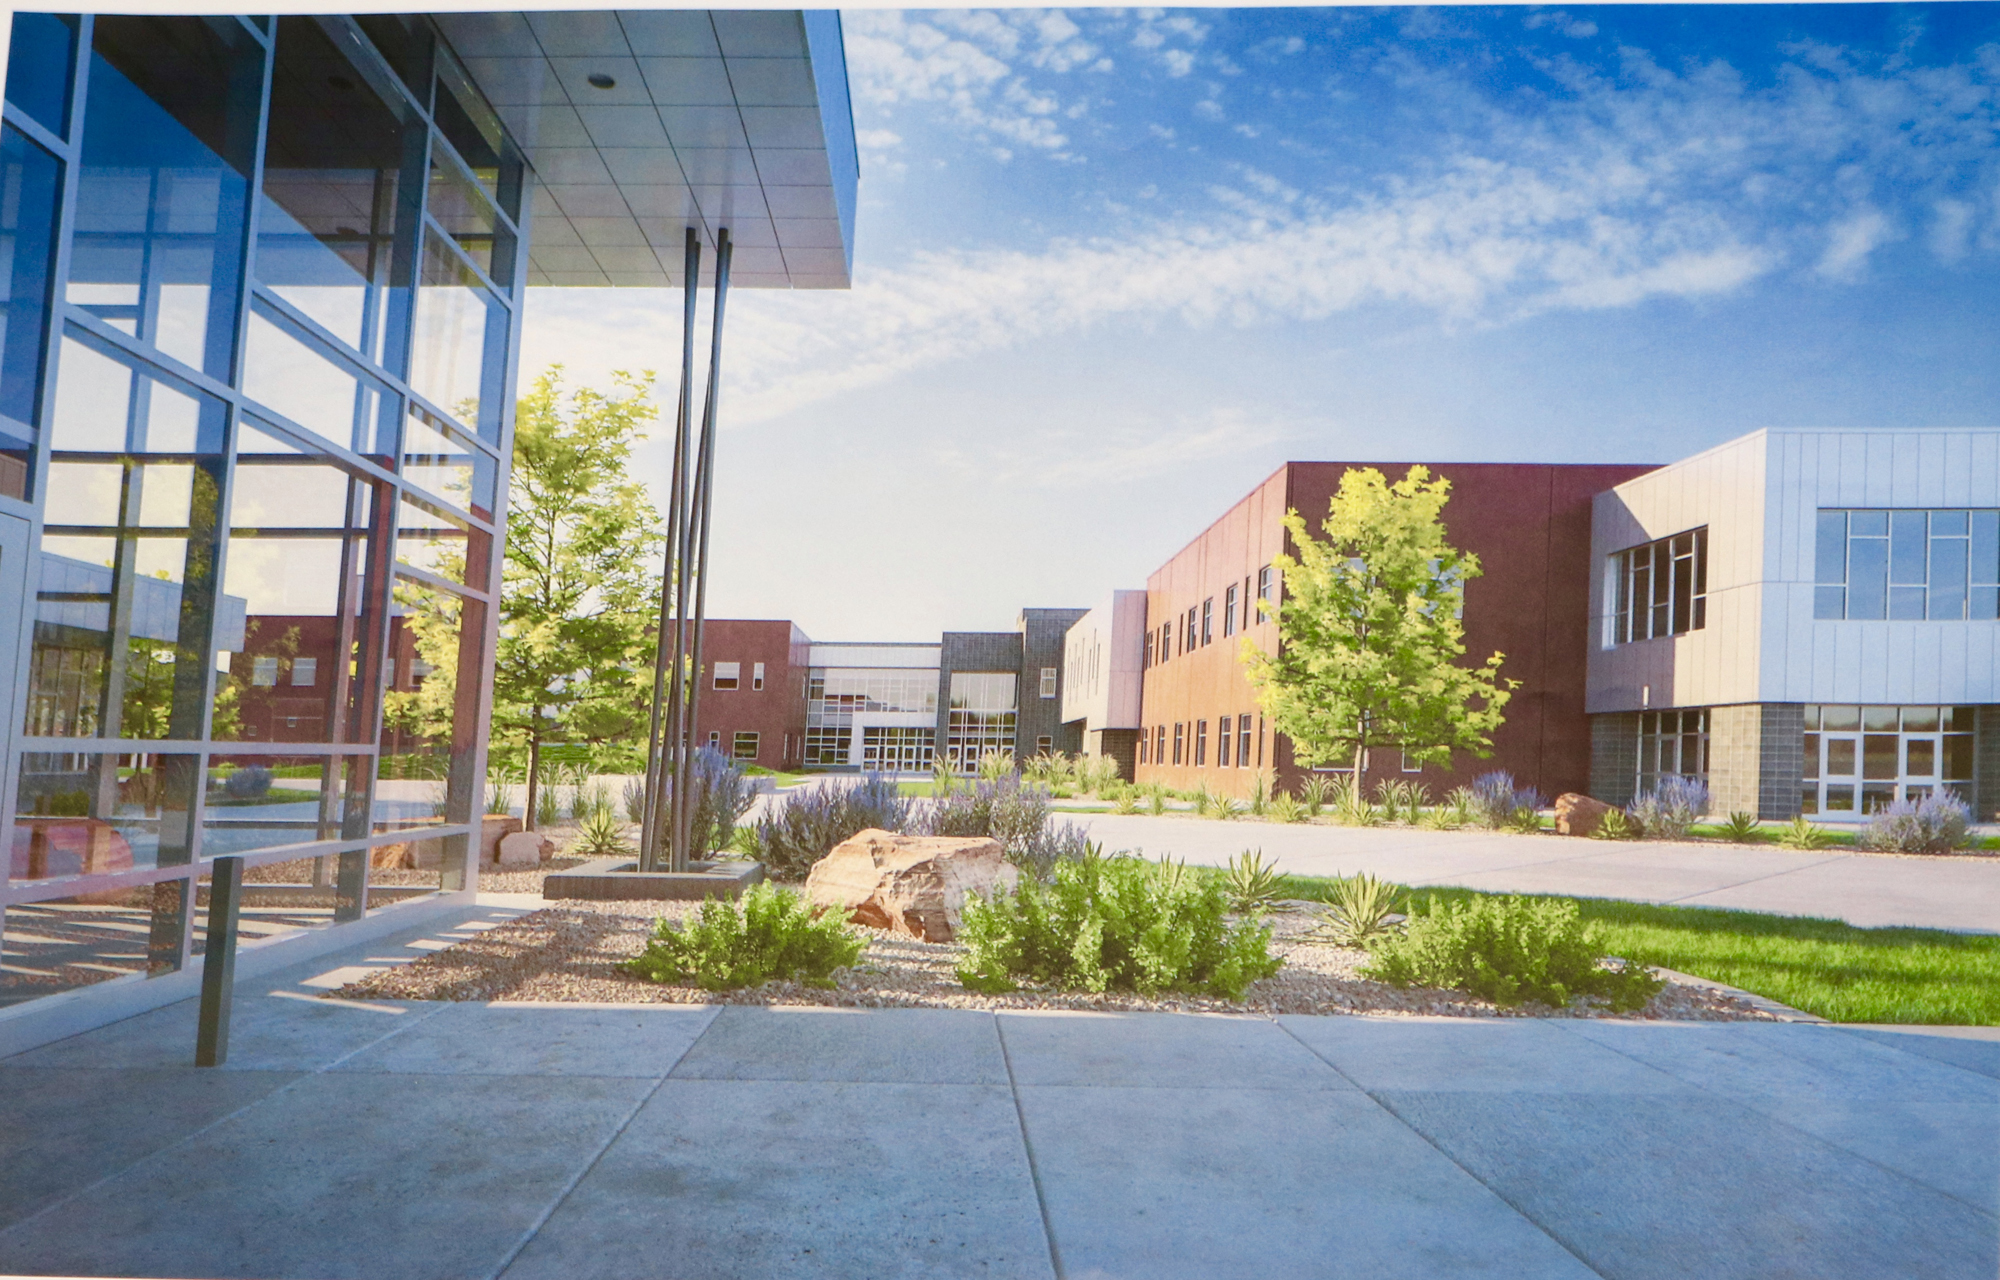 Photo of Judge Memorial Catholic High School - Salt Lake City, UT, United  States